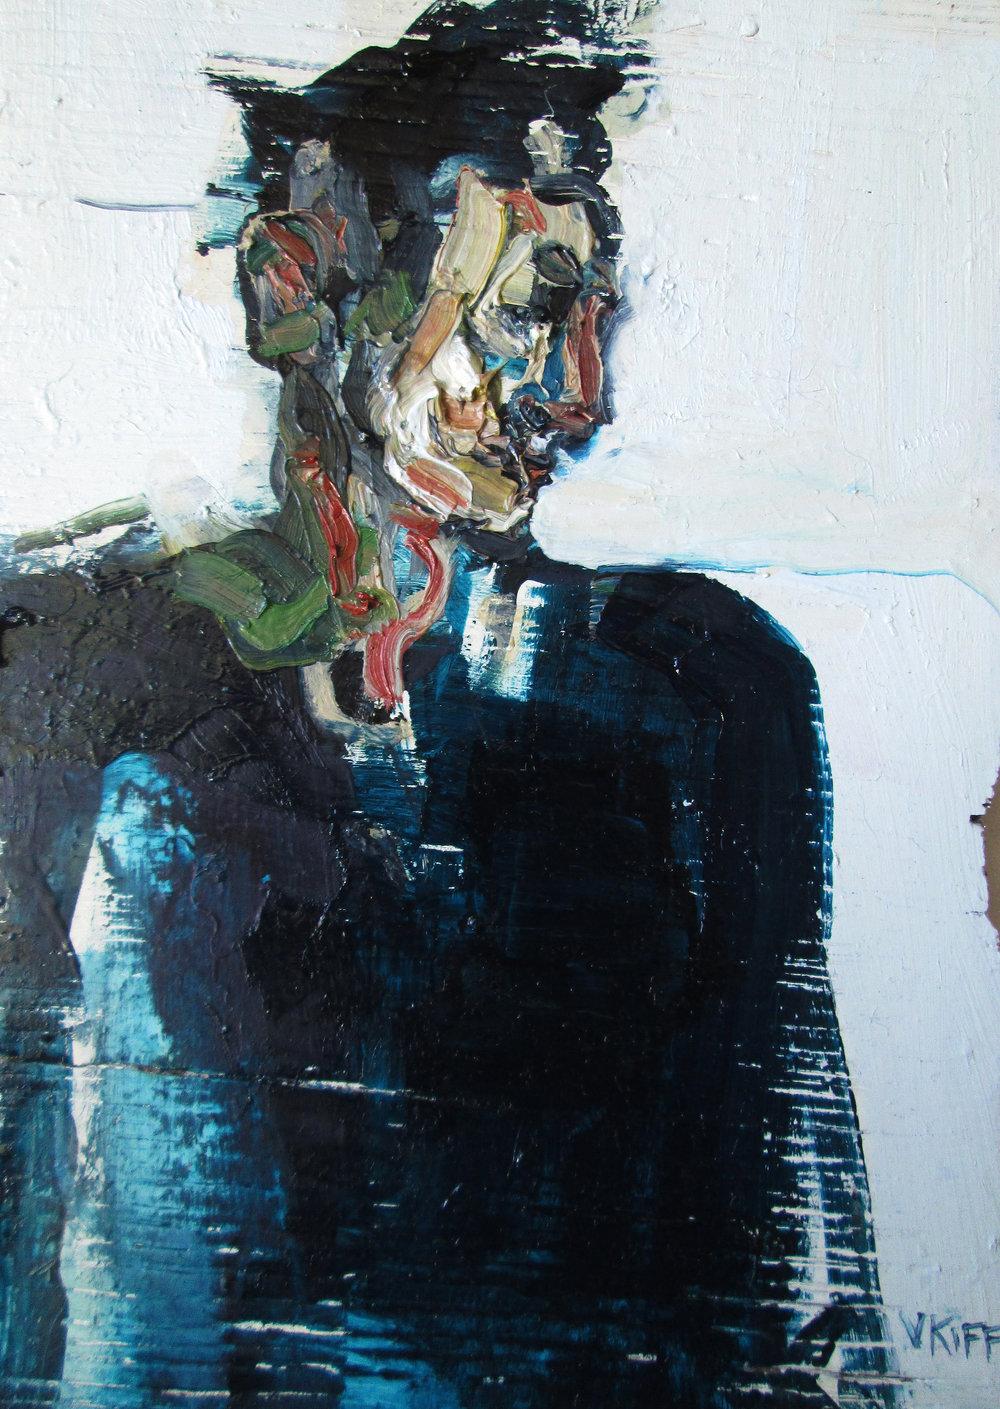 Artist: Victoria Kiff  Title: Beside the Reservoir  Size: 21 x 15 cm  Medium: Oil on wood panel  SOLD